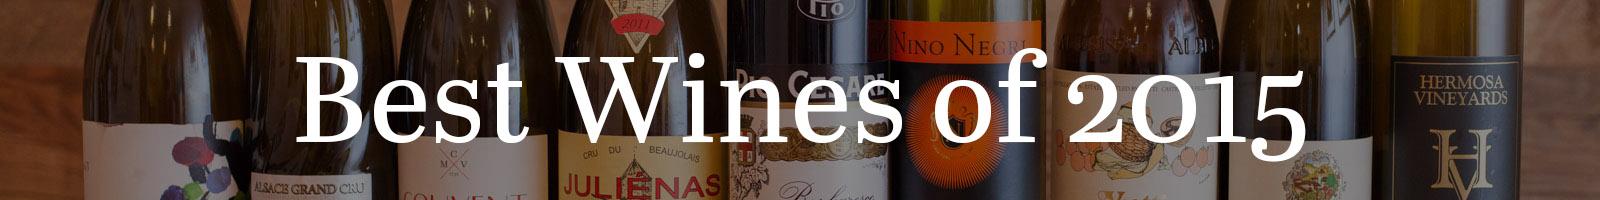 Opening a Bottle Best Wines of 2015